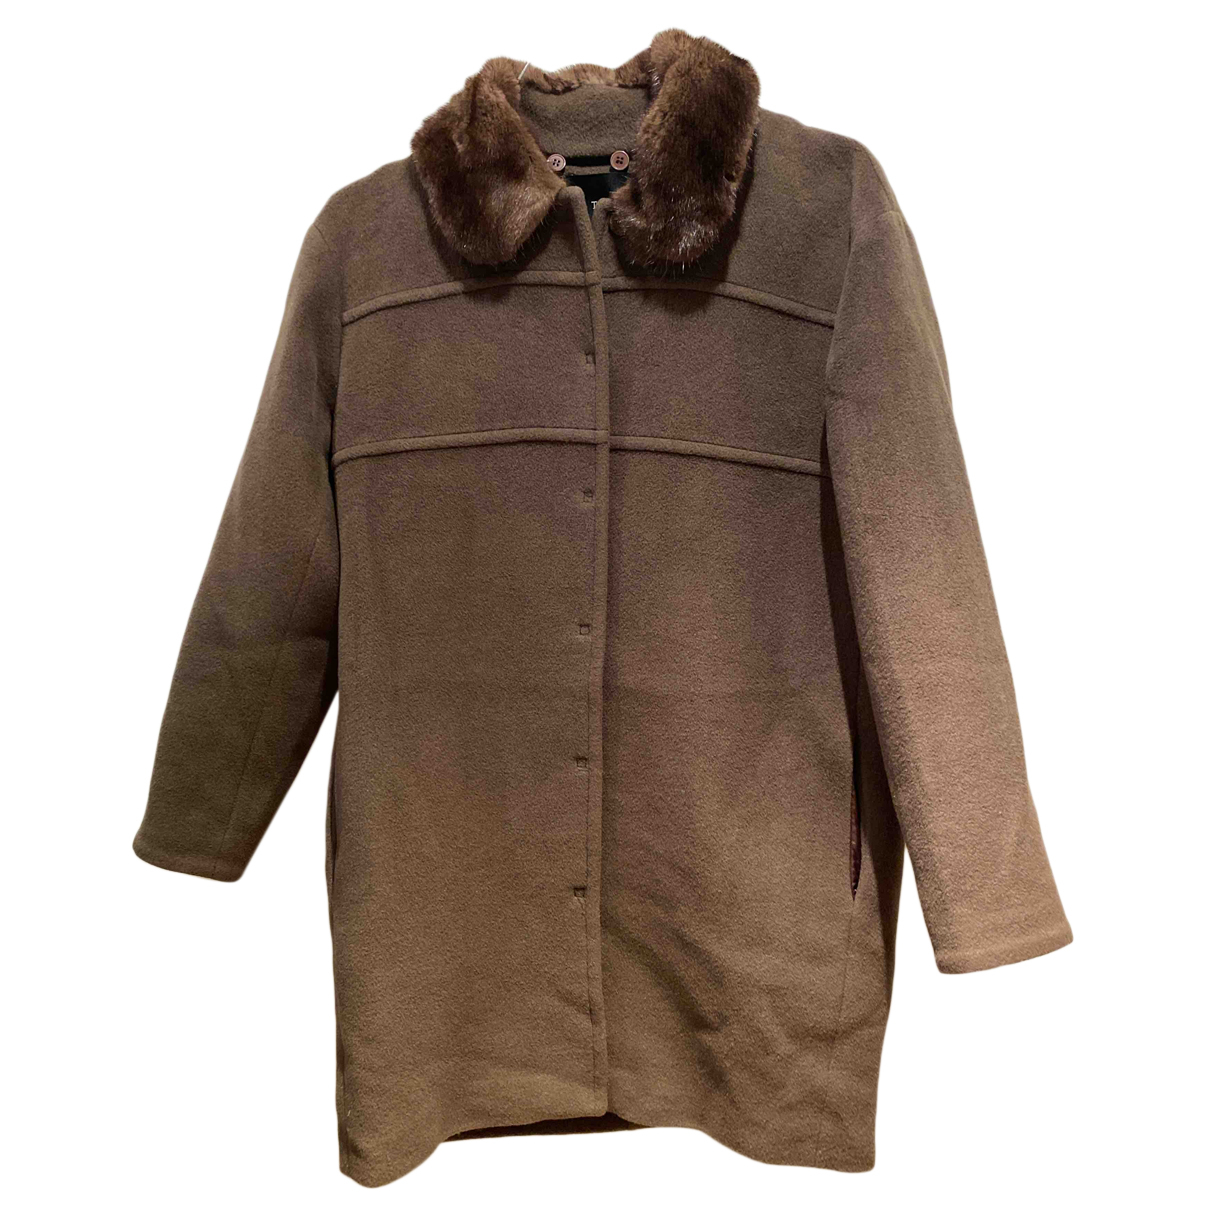 Tara Jarmon N Brown Wool coat for Women 38 FR